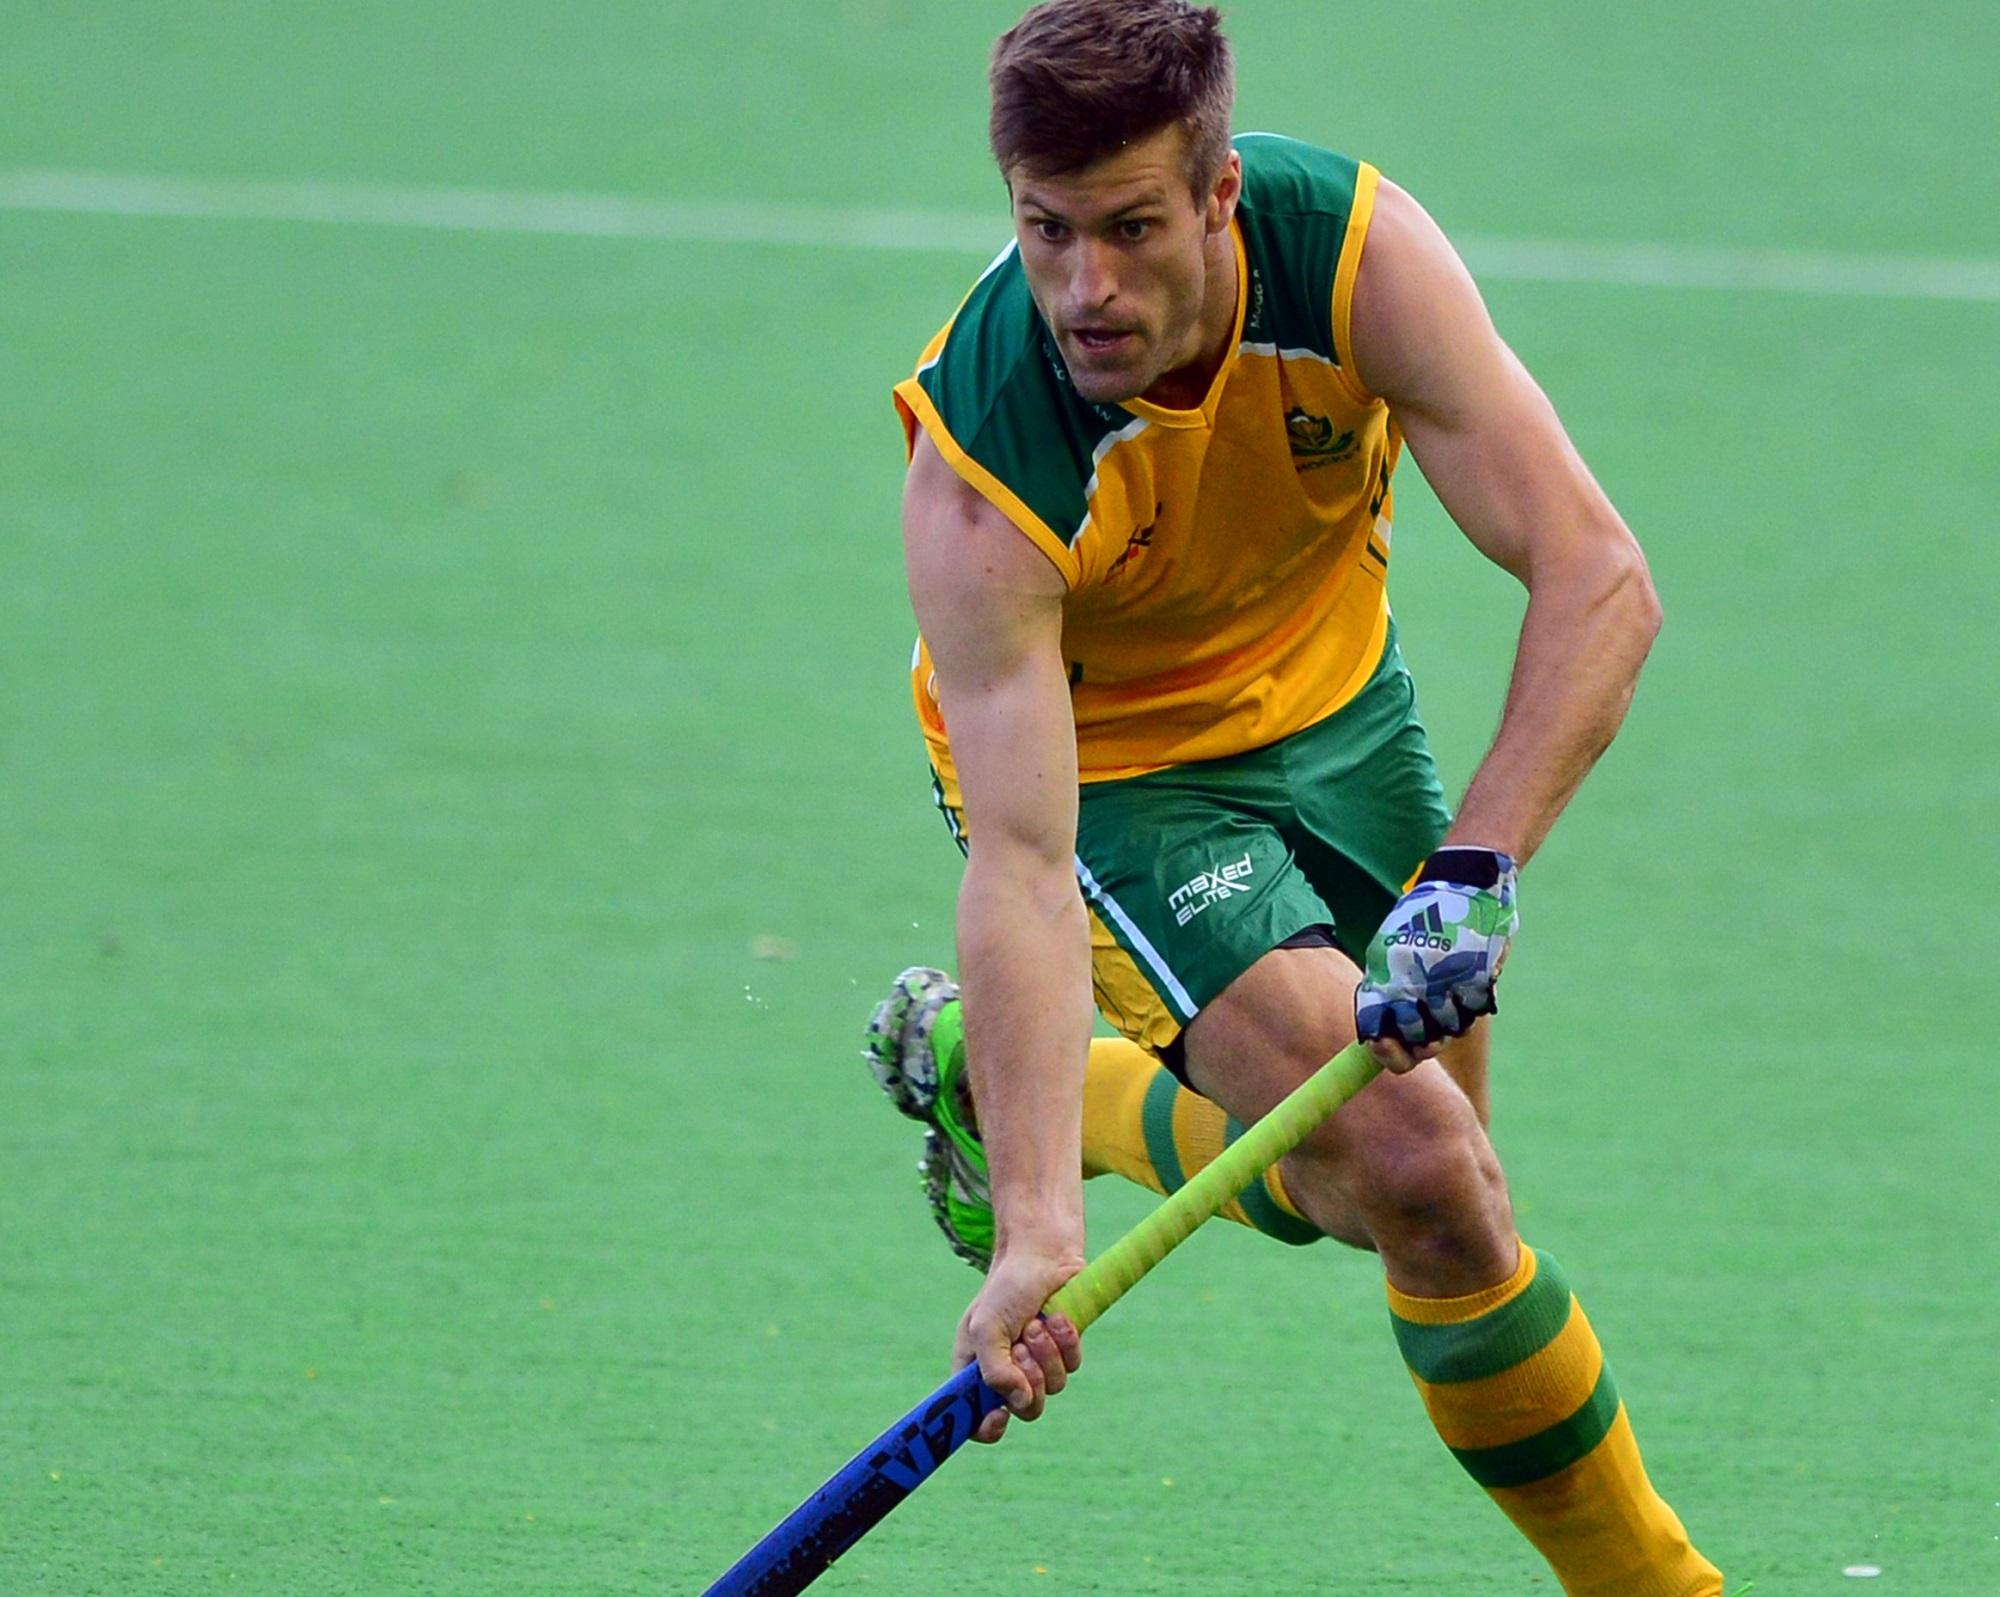 Former Player Stimulates Debate on SA Hockey High-Performance Model